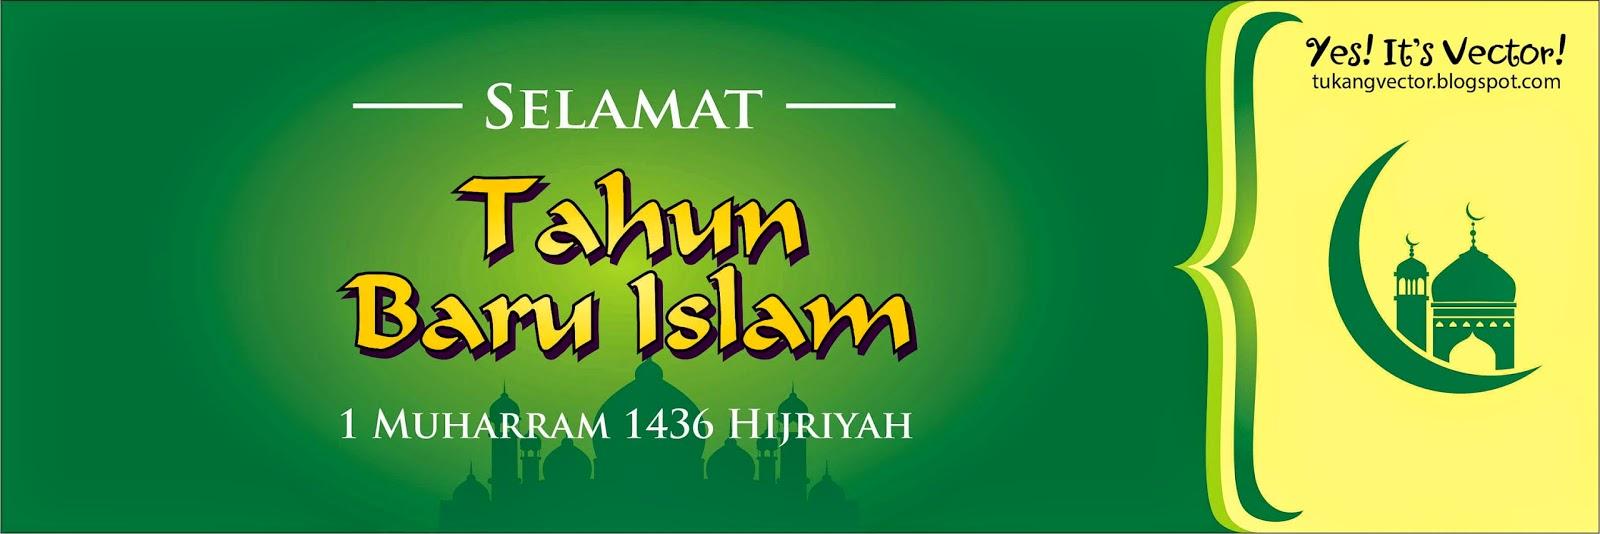 MI HAYATUL ISLAM: DOWNLOAD TEMPLATE BANNER TAHUN BARU ...